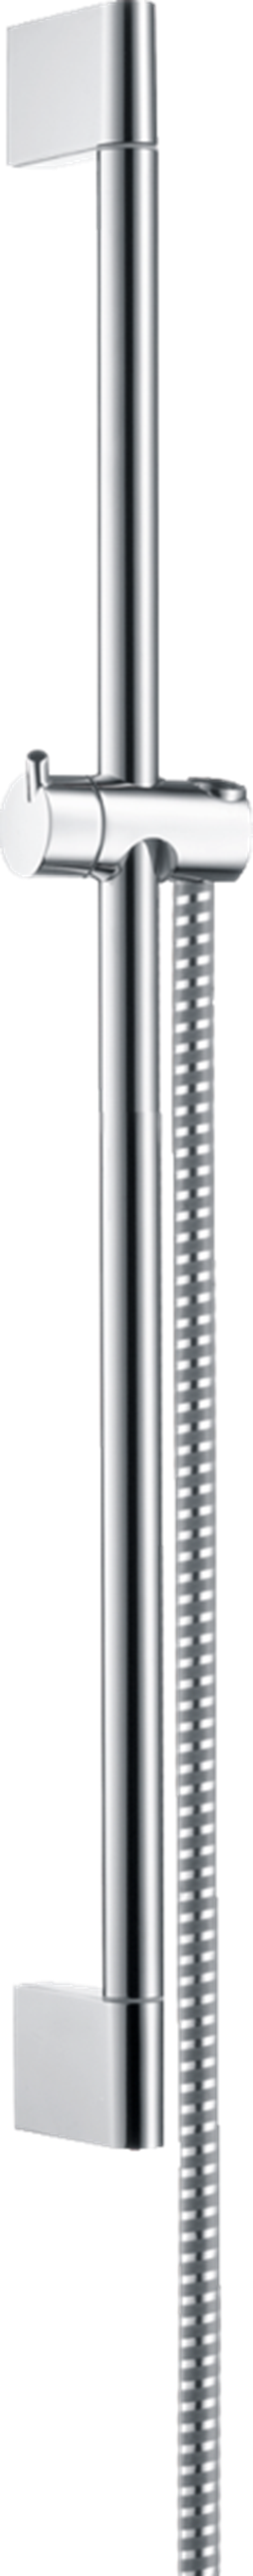 Hansgrohe Unica 27615000